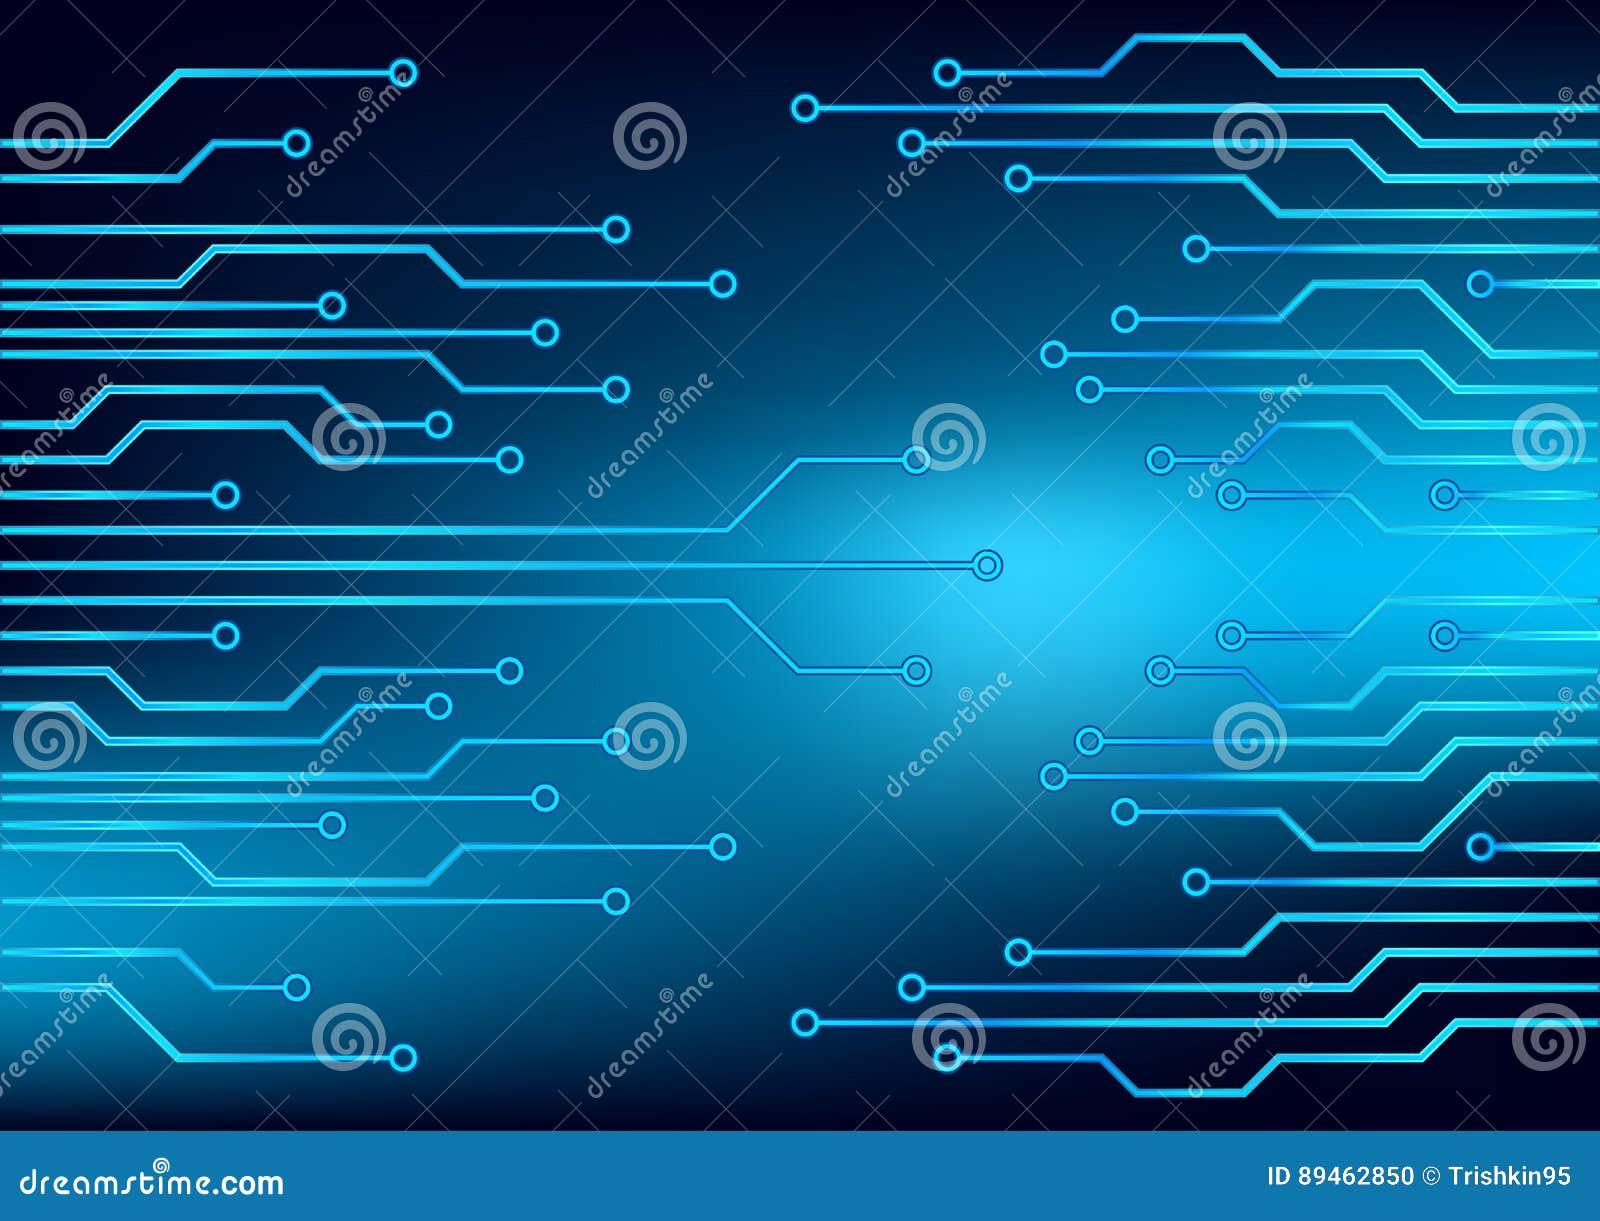 Image Electrical circuit . stock illustration. Illustration of light ...